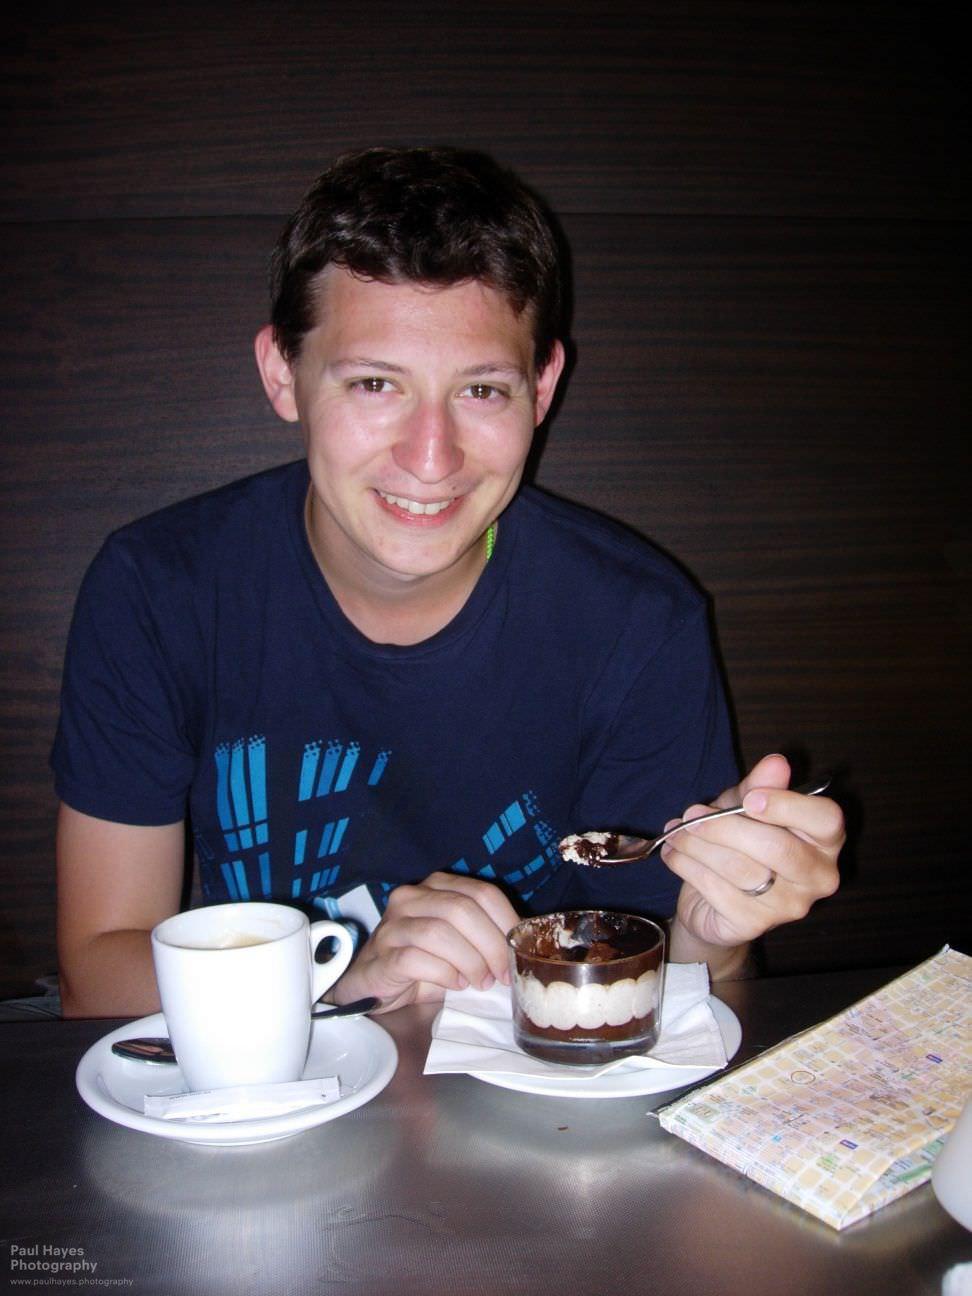 Paul with his almond chocolate dessert